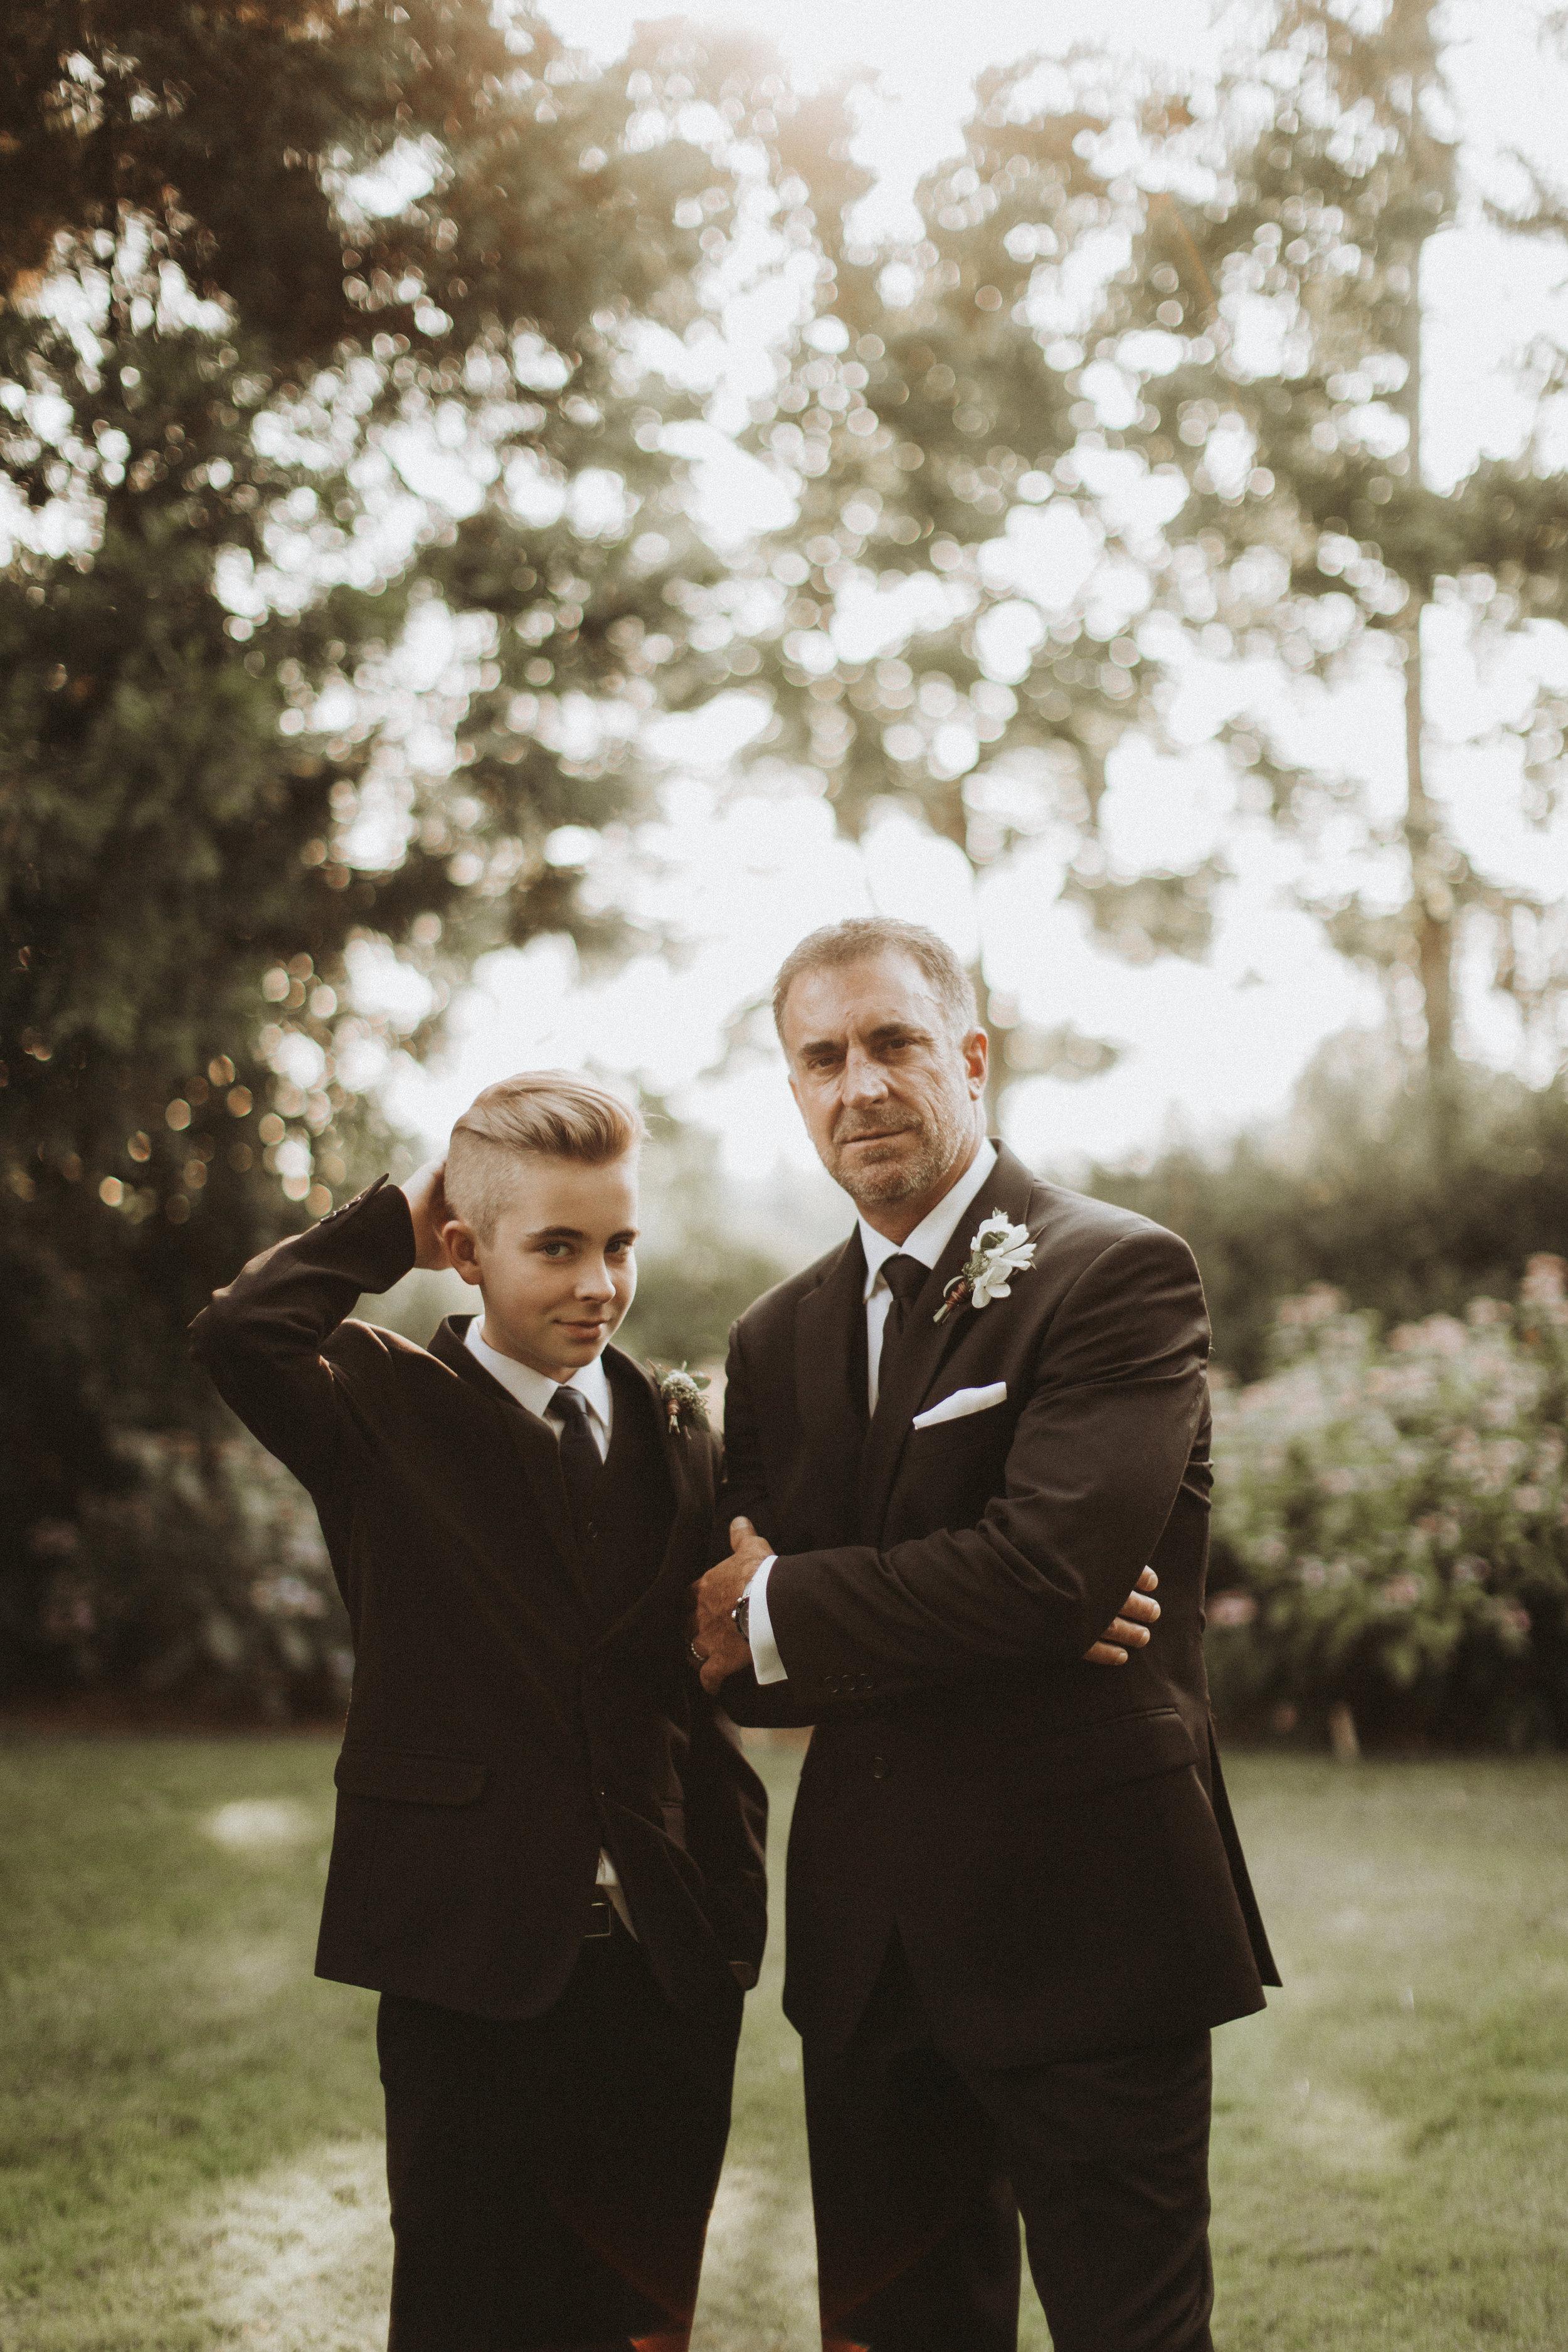 PORTLAND INTIMATE BACKYARD WEDDING_JENNY CHOKBENGBOUN PHOTO-413.JPG